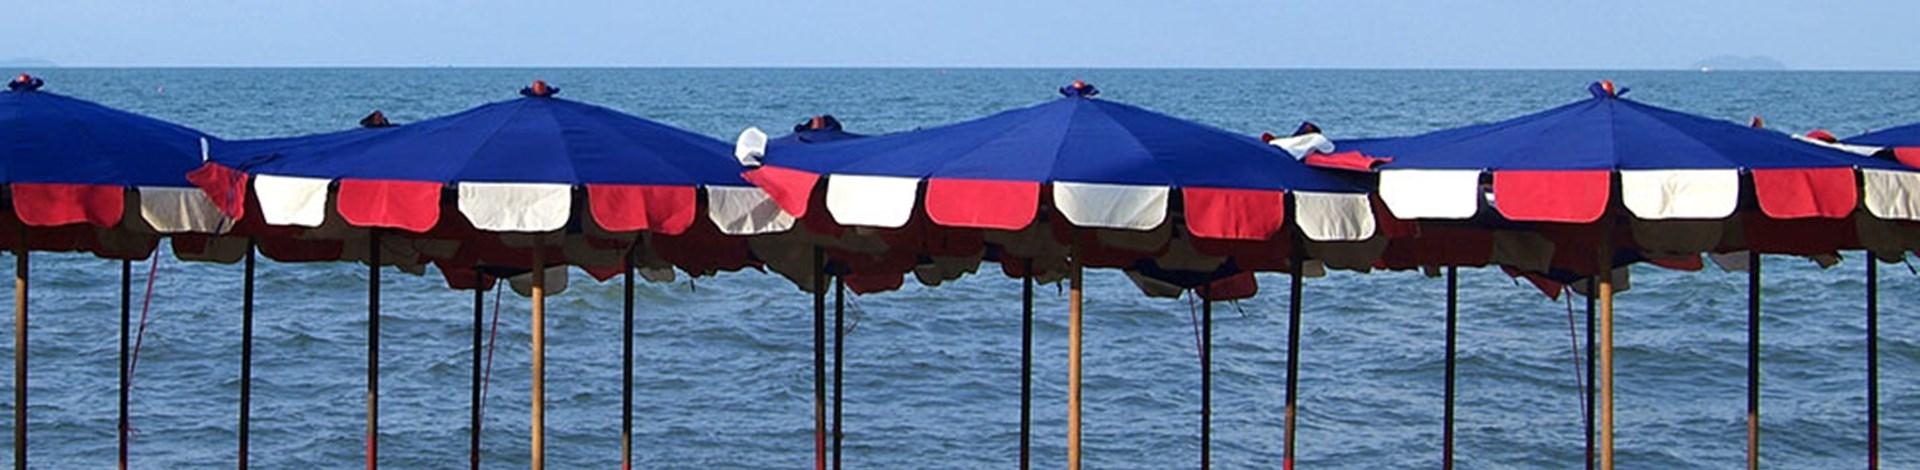 Wong Phra Chan Beach